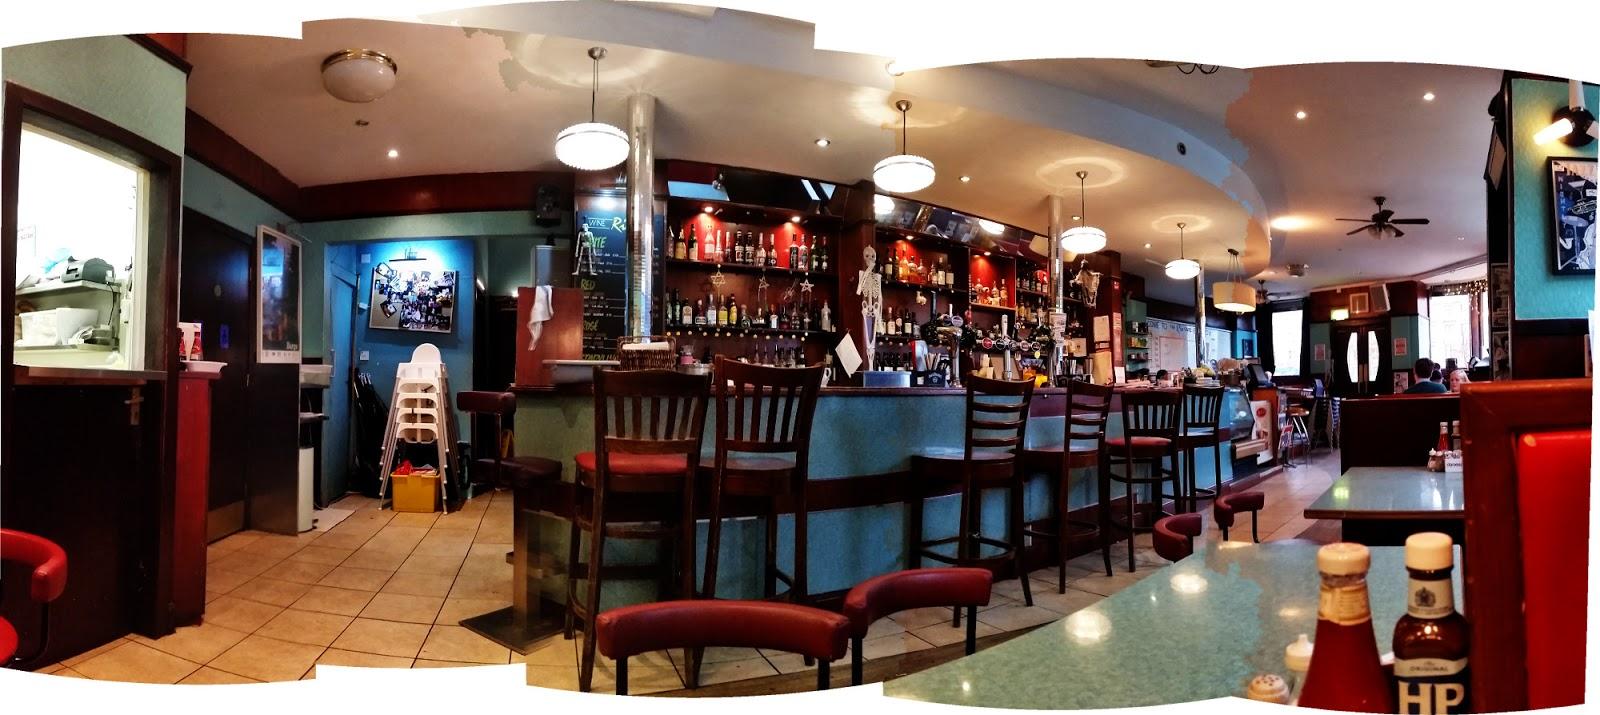 Rio Cafe, Glasgow